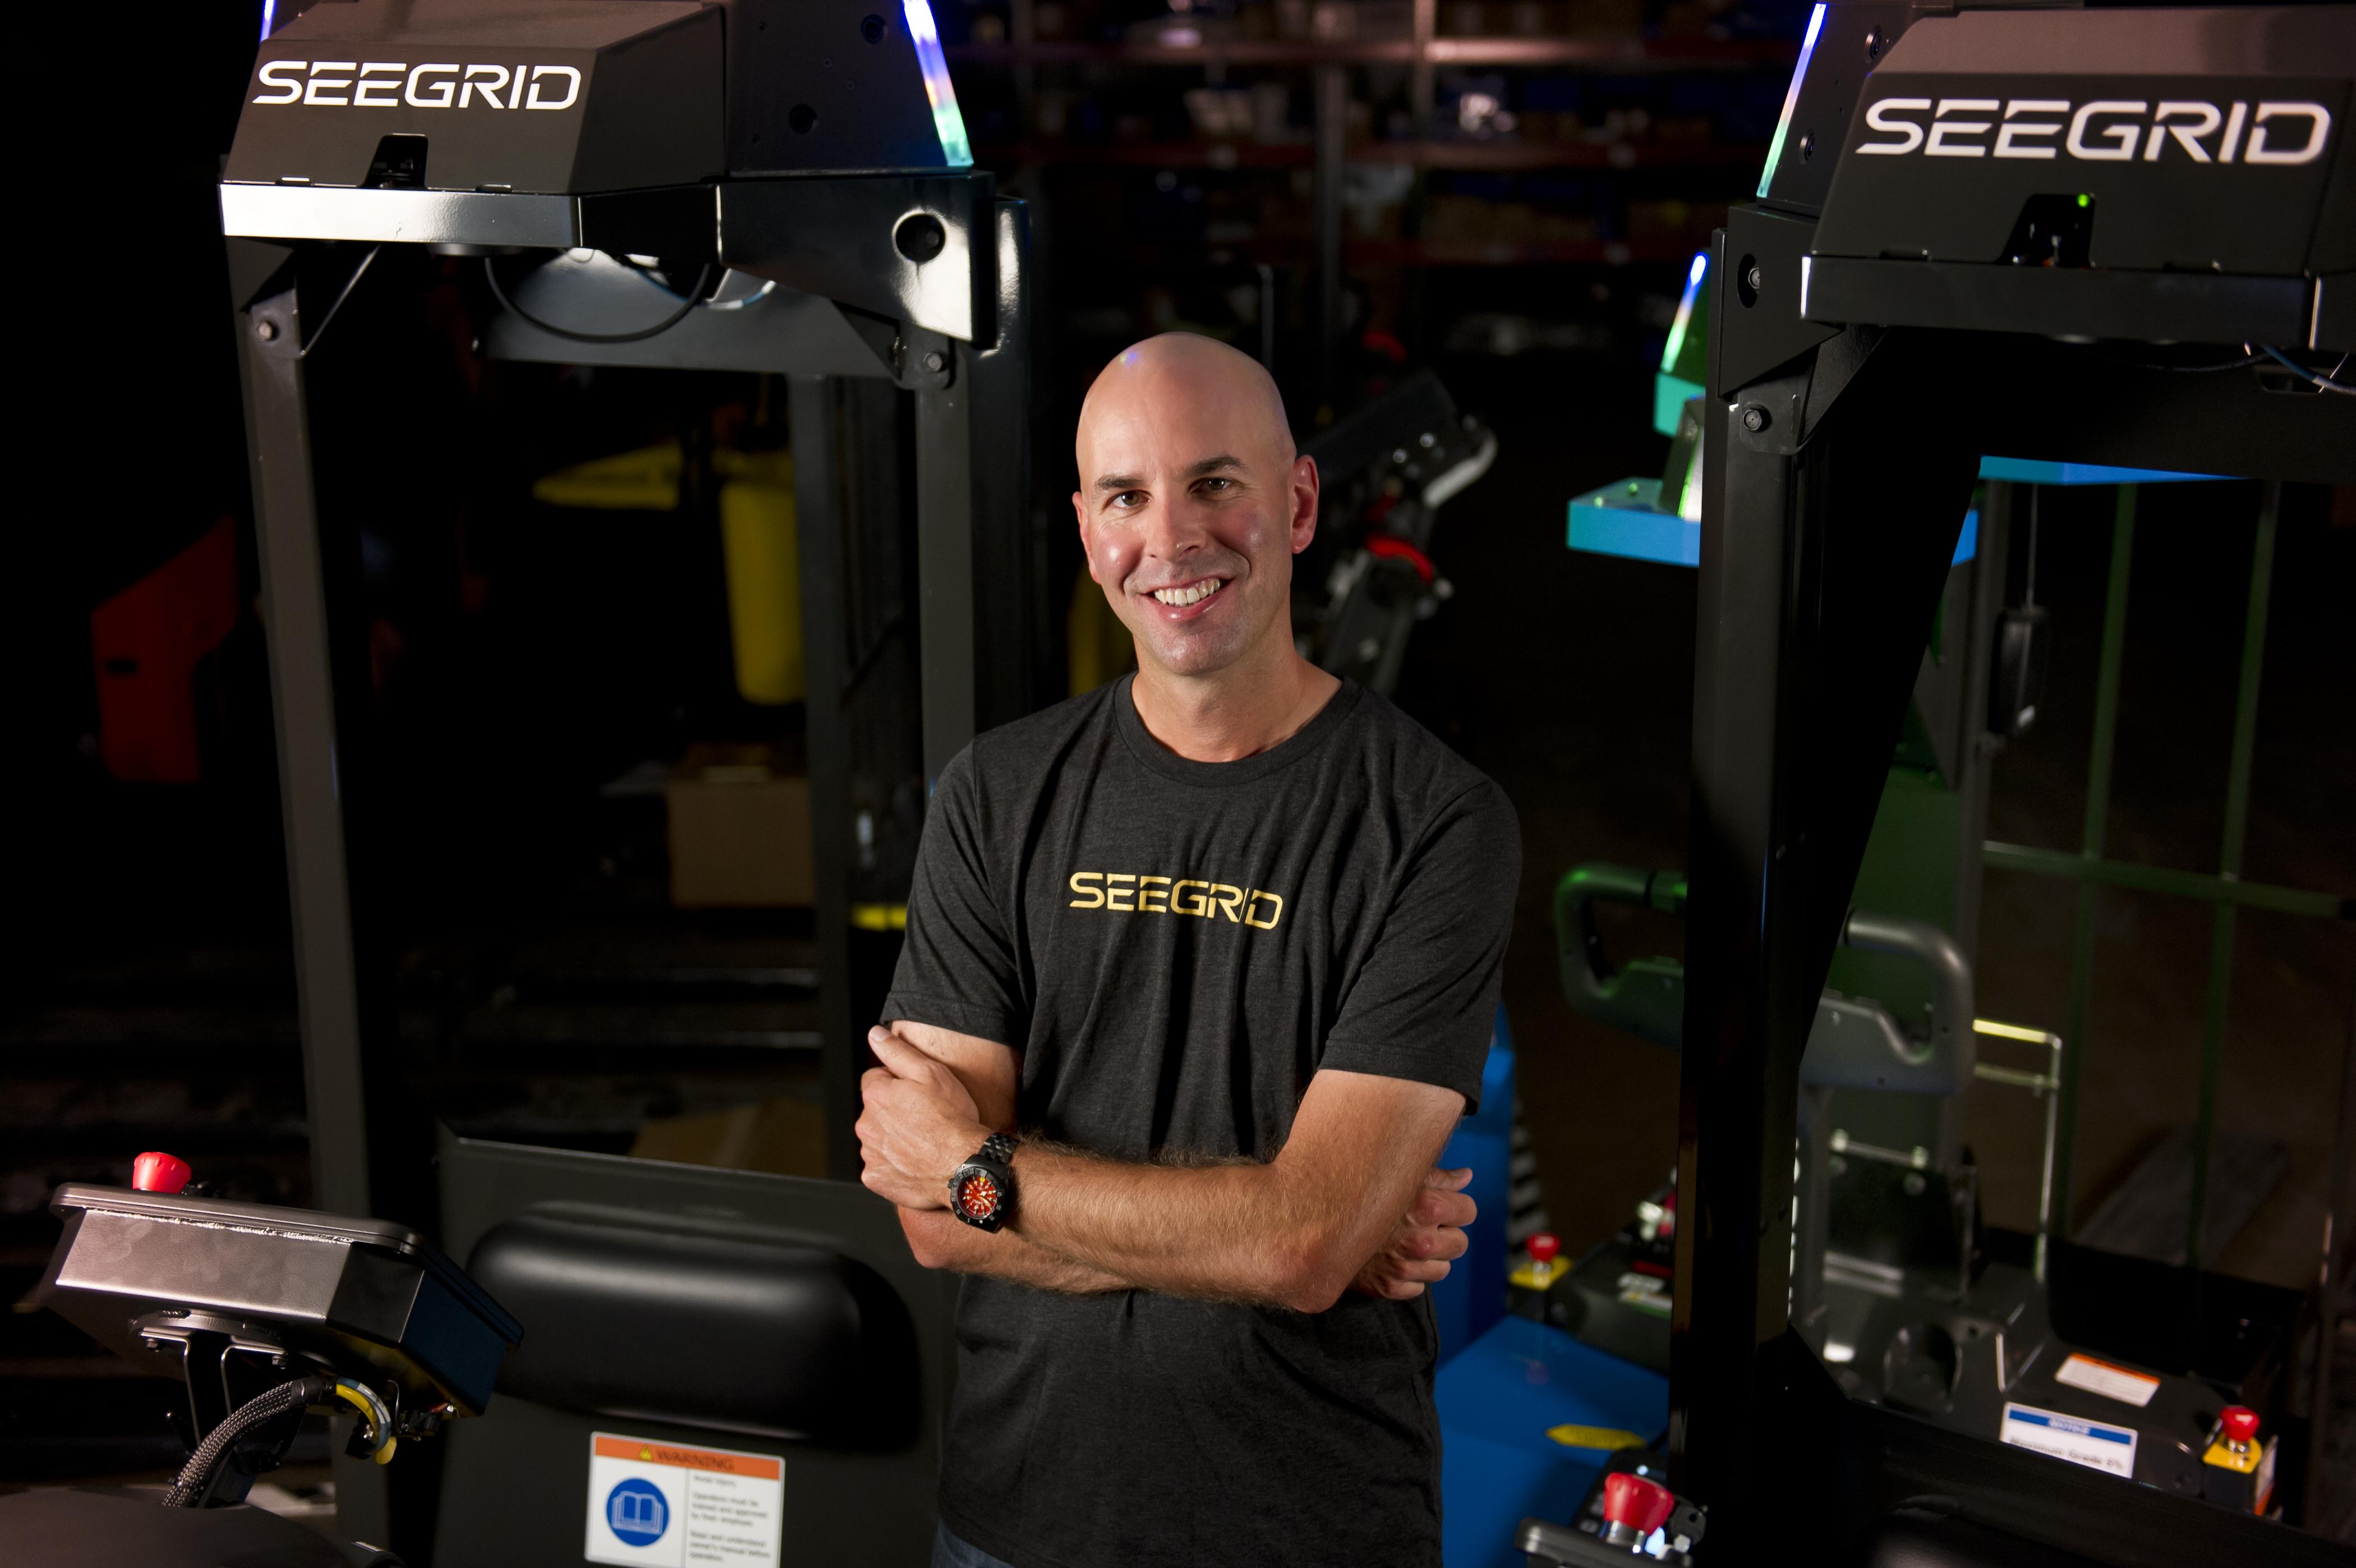 Jim Rock, CEO of Seegrid